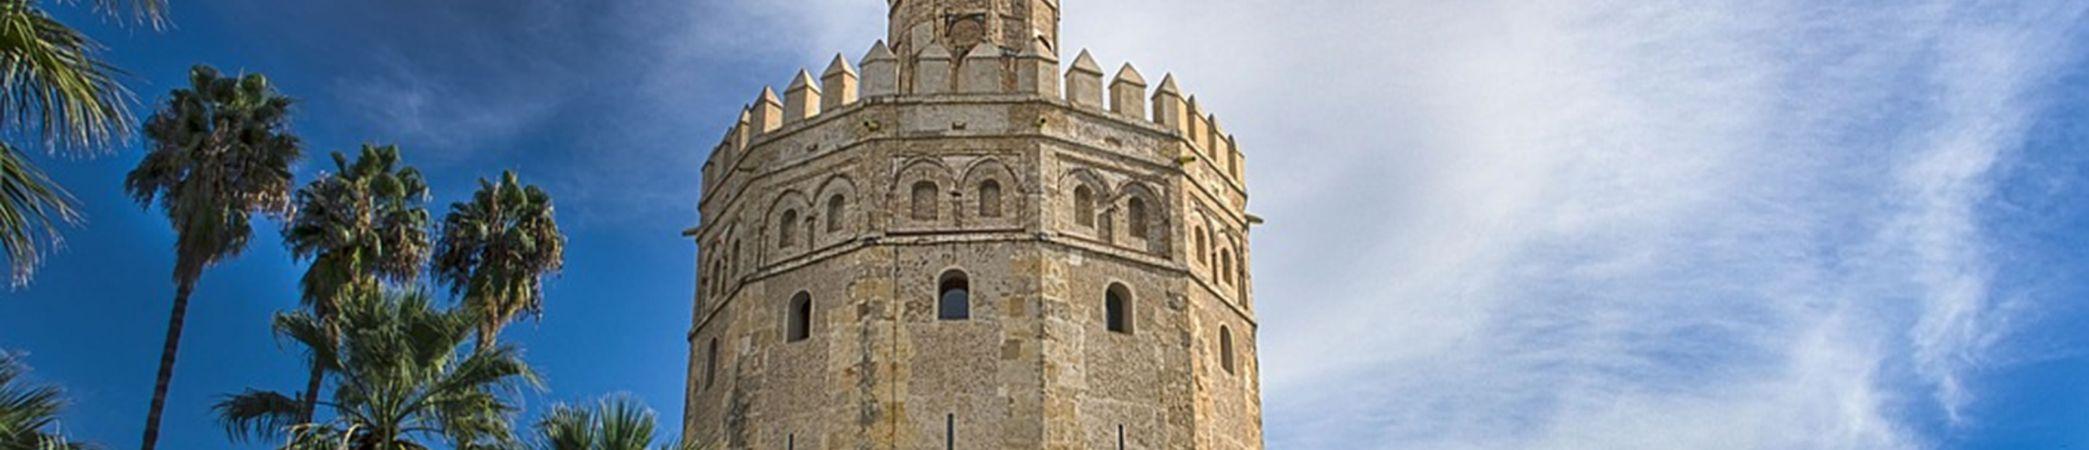 Activities to enjoy in Seville